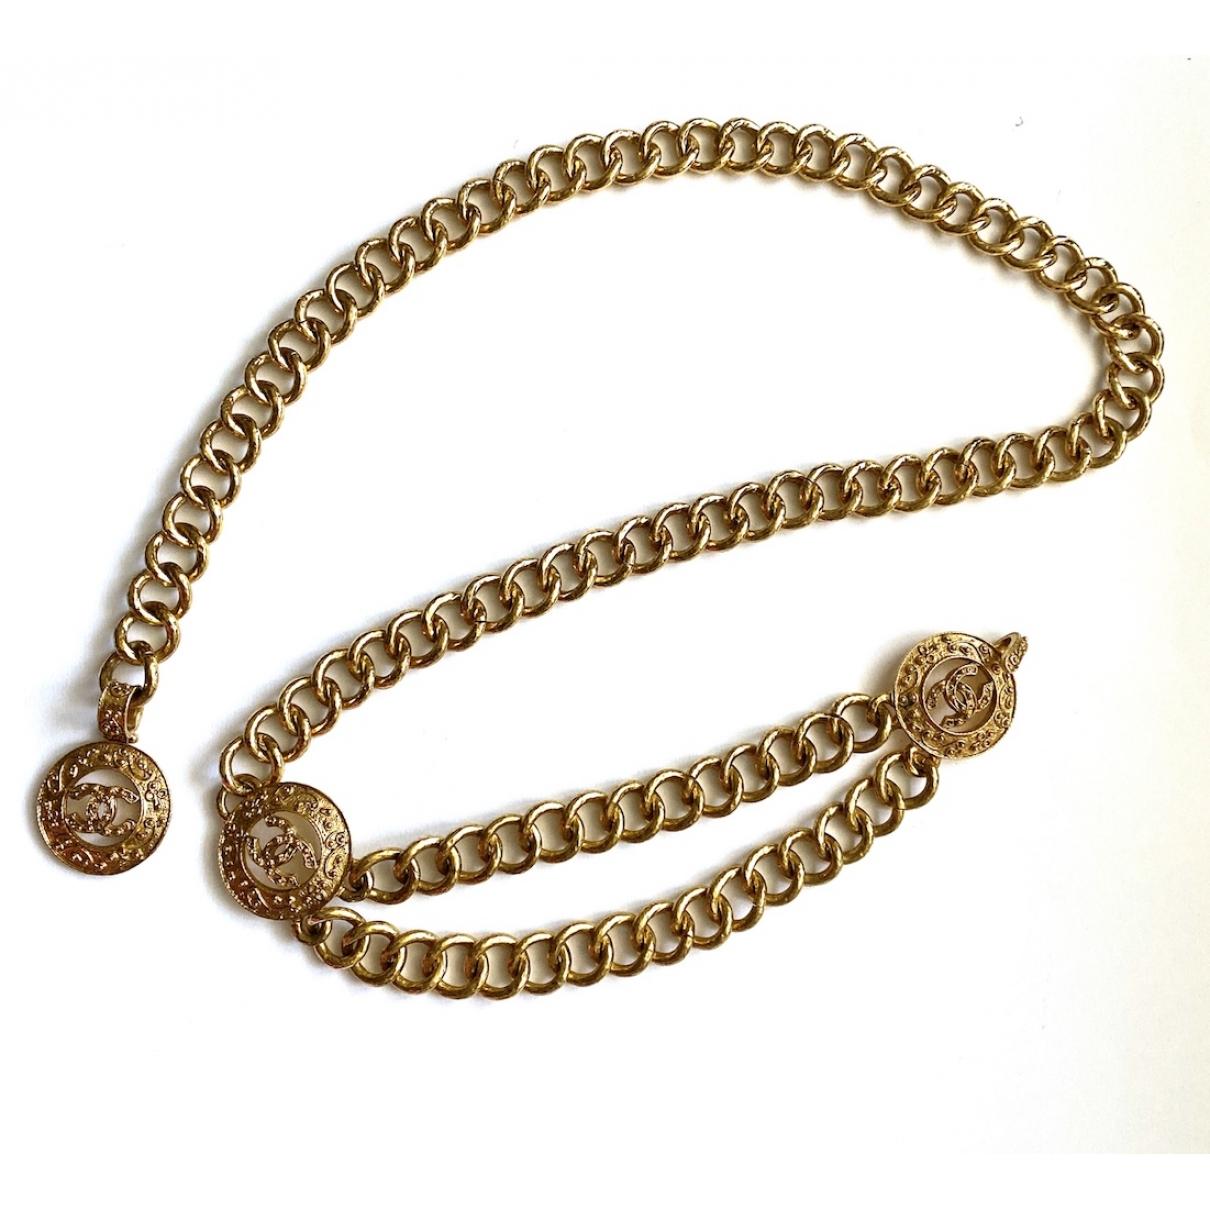 Chanel \N Gold Metal belt for Women 95 cm